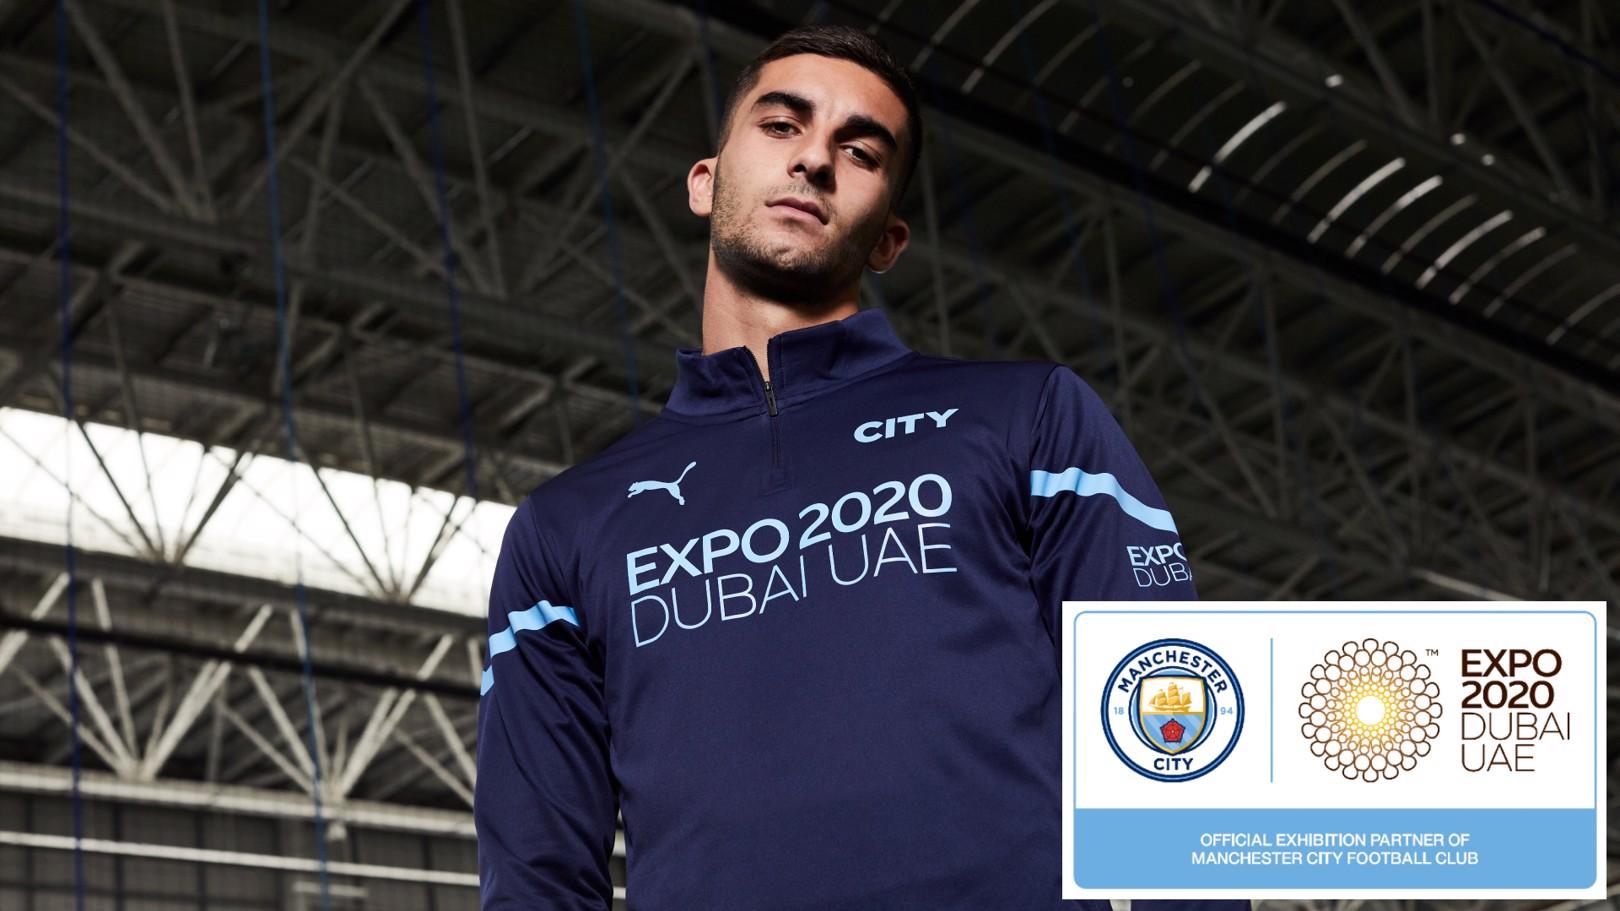 Manchester City unveils Expo 2020 Dubai as new training kit partner